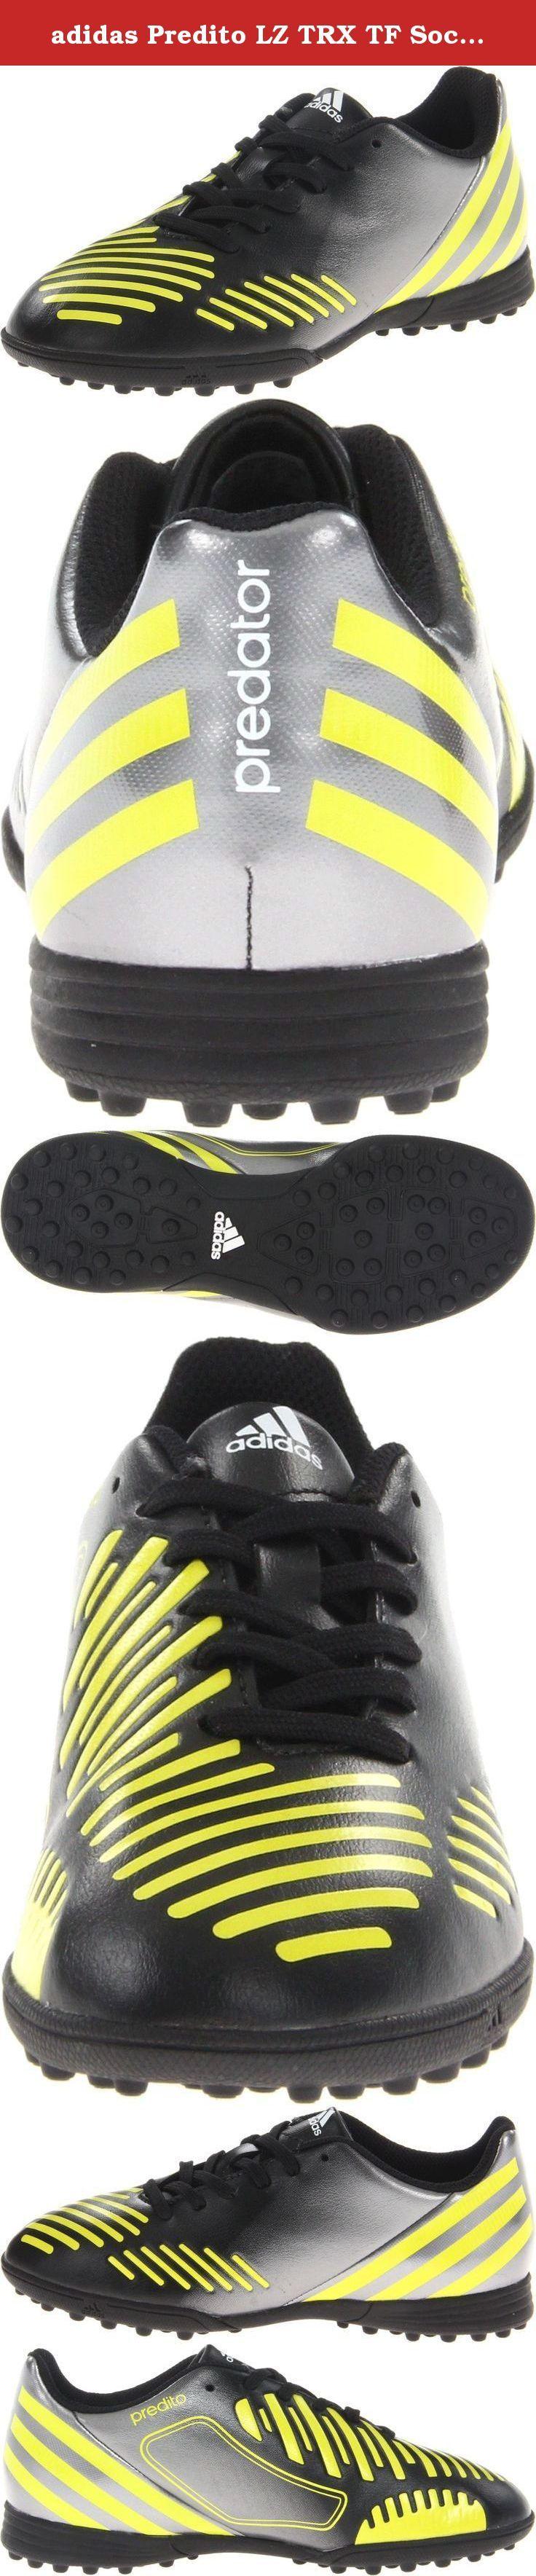 adidas Predito LZ TRX TF Soccer Cleat,Black/Lab Lime/Neo Iron Metallic,5 M US Big Kid.